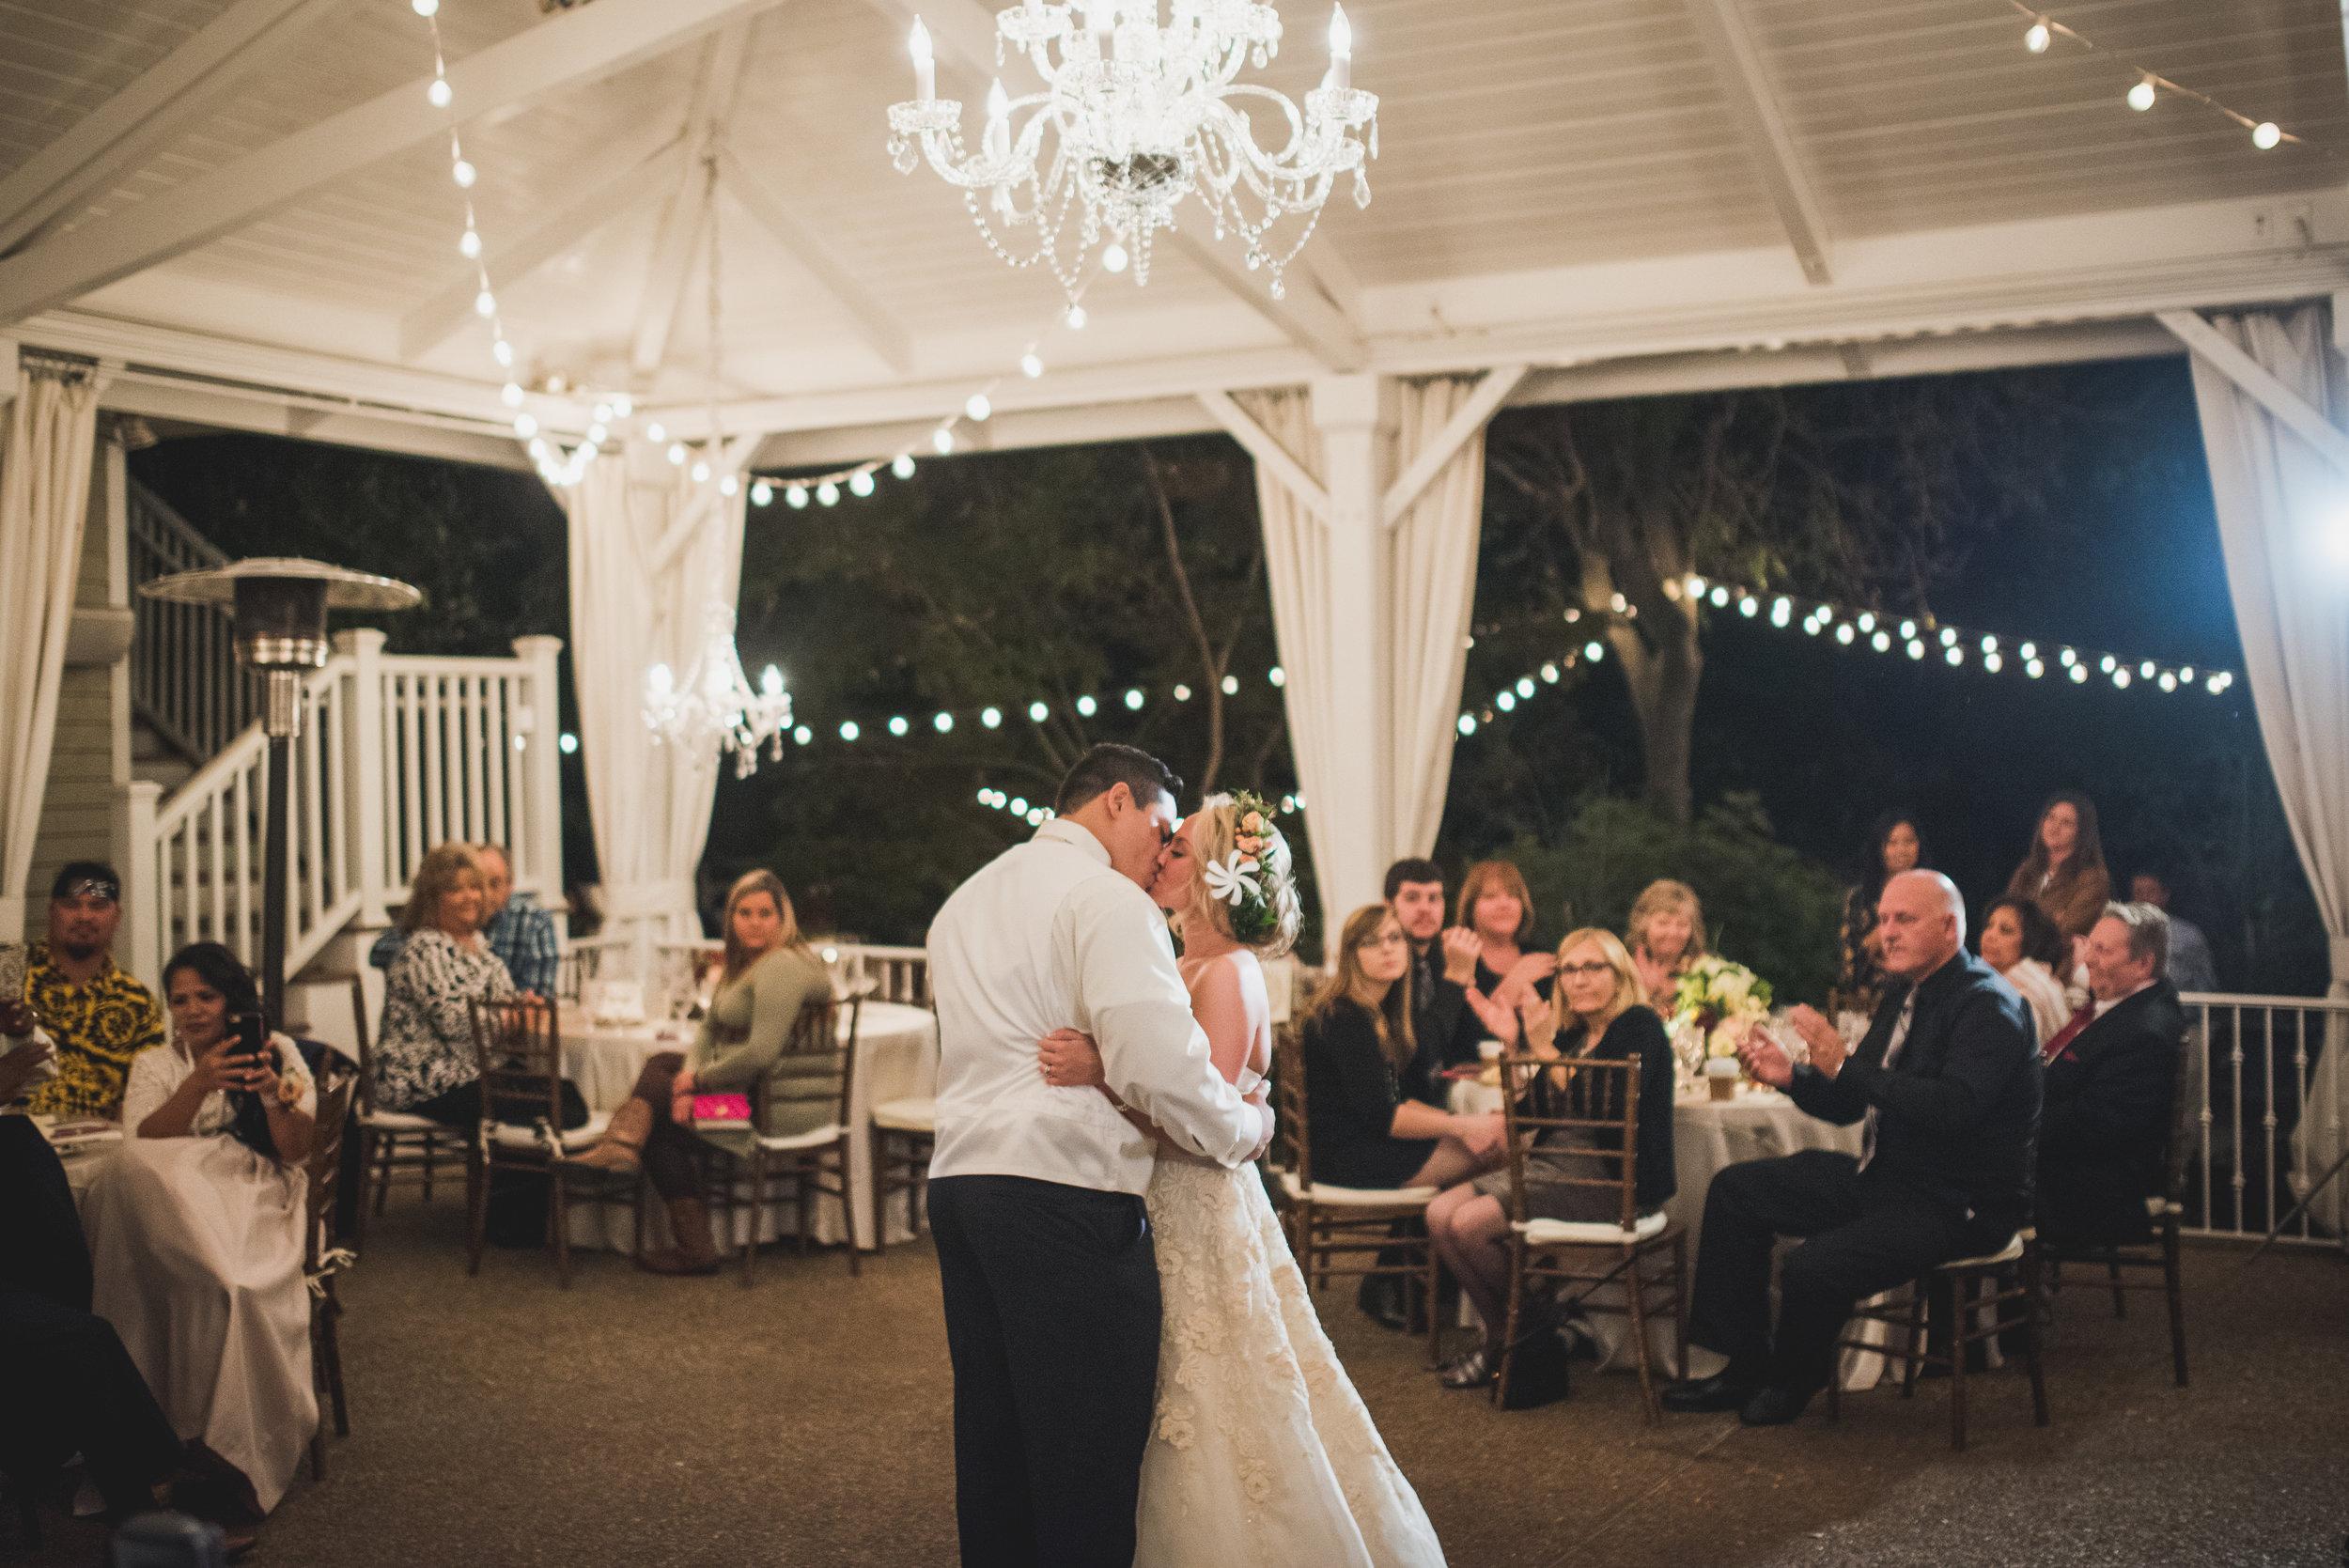 Nashville-wedding-photographers-CJ's-Off-The-Square-60.JPG